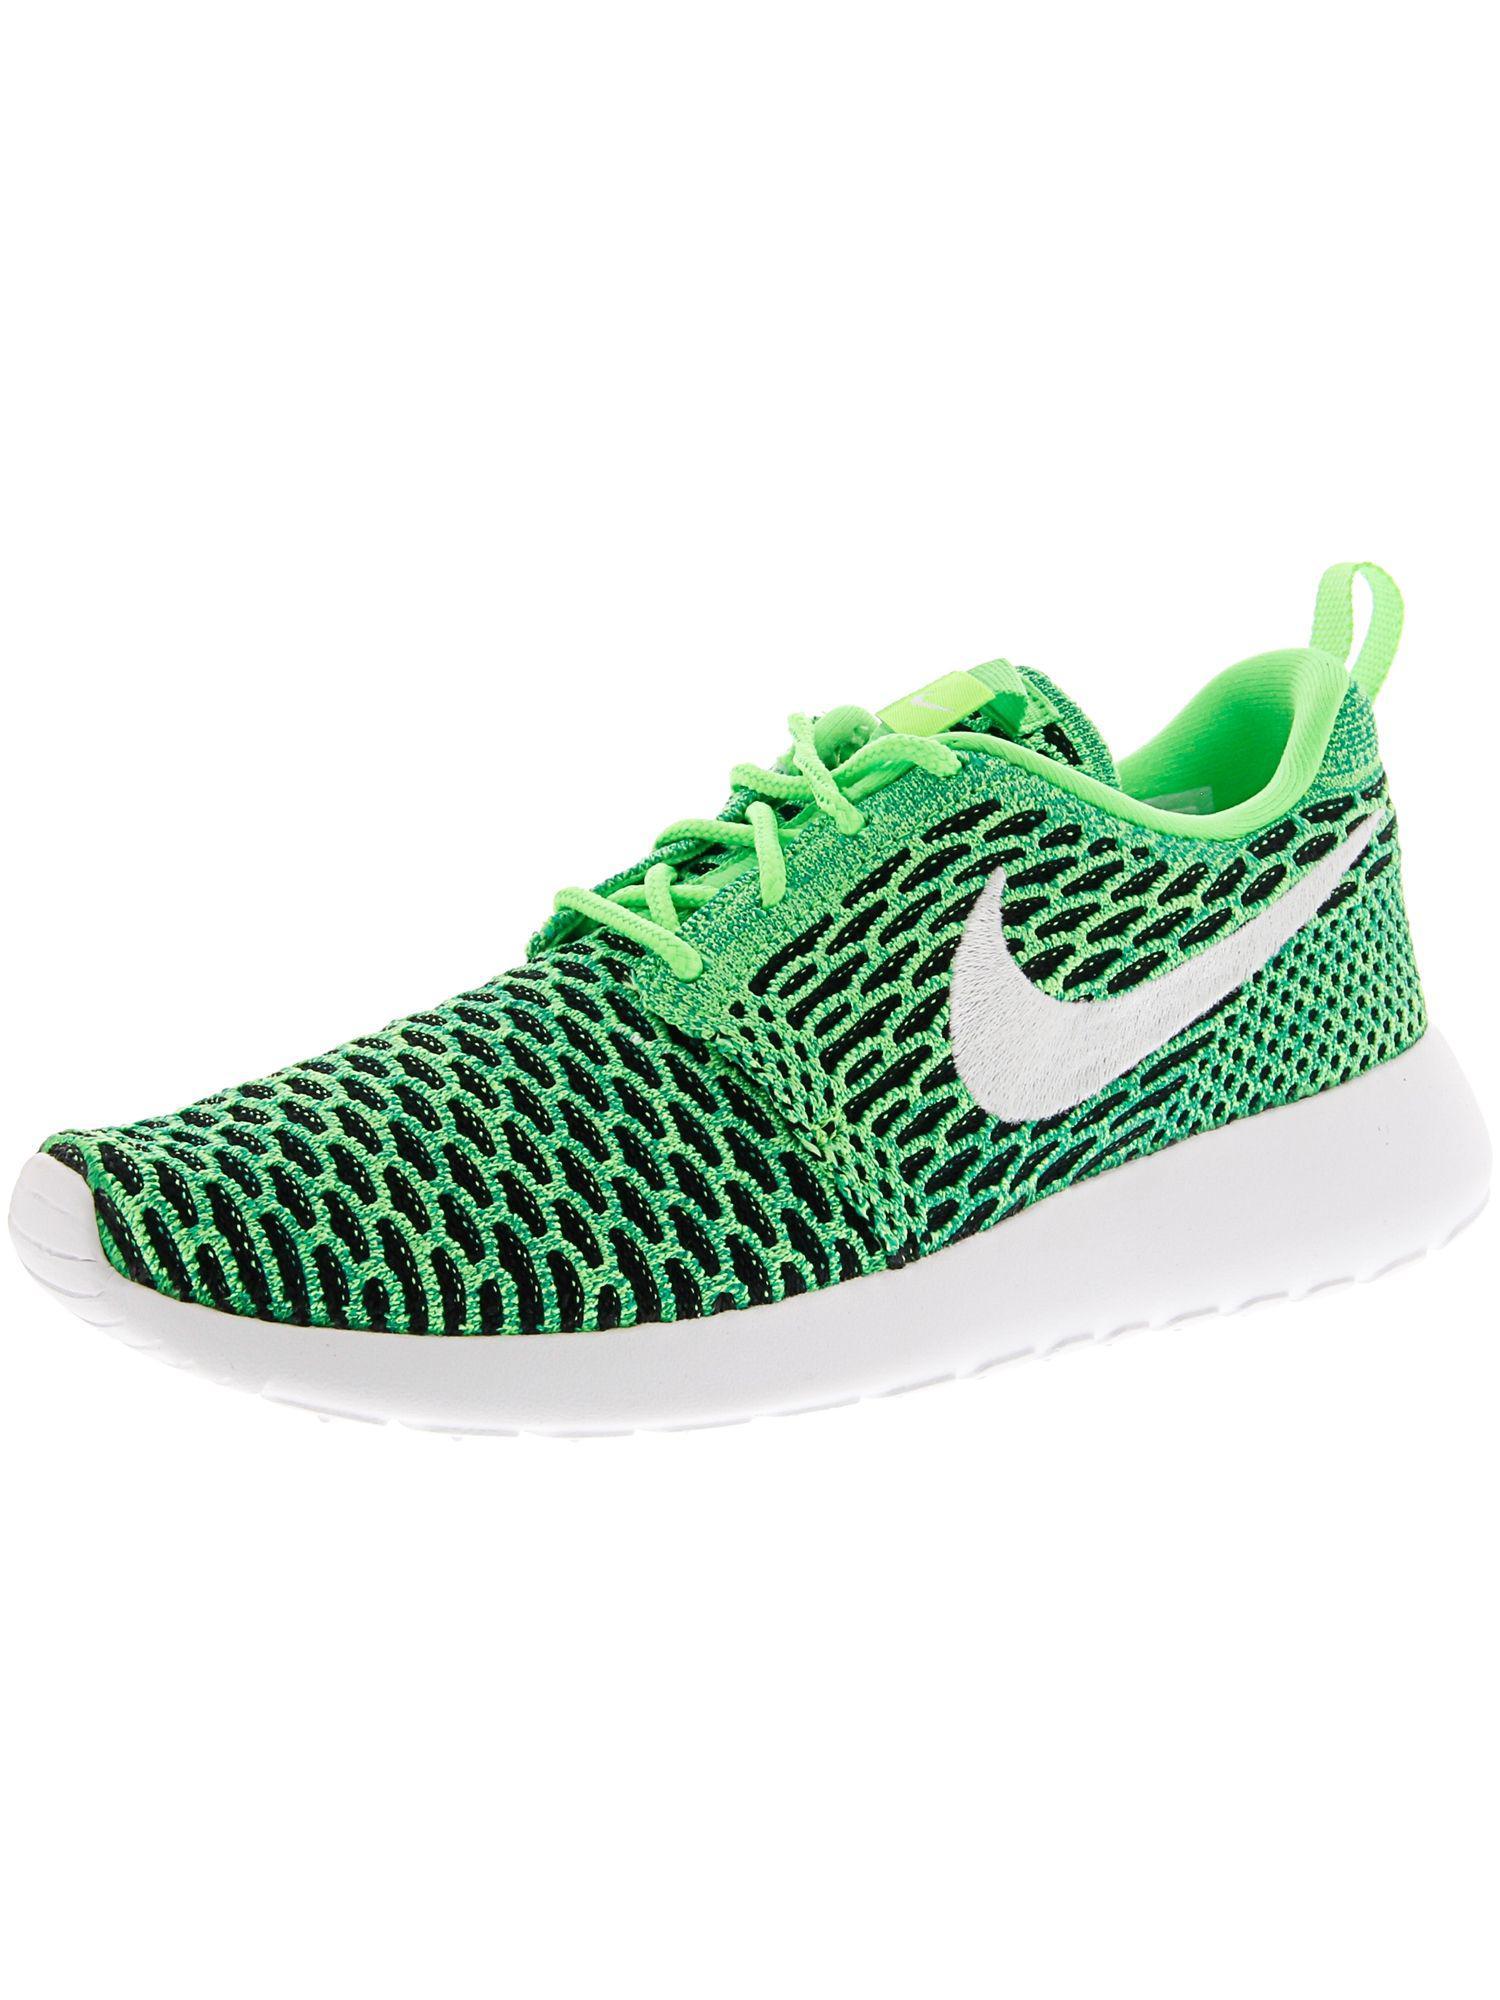 f348516b13b4b Lyst - Nike   s 704927-305 Trail Running Shoes in Green